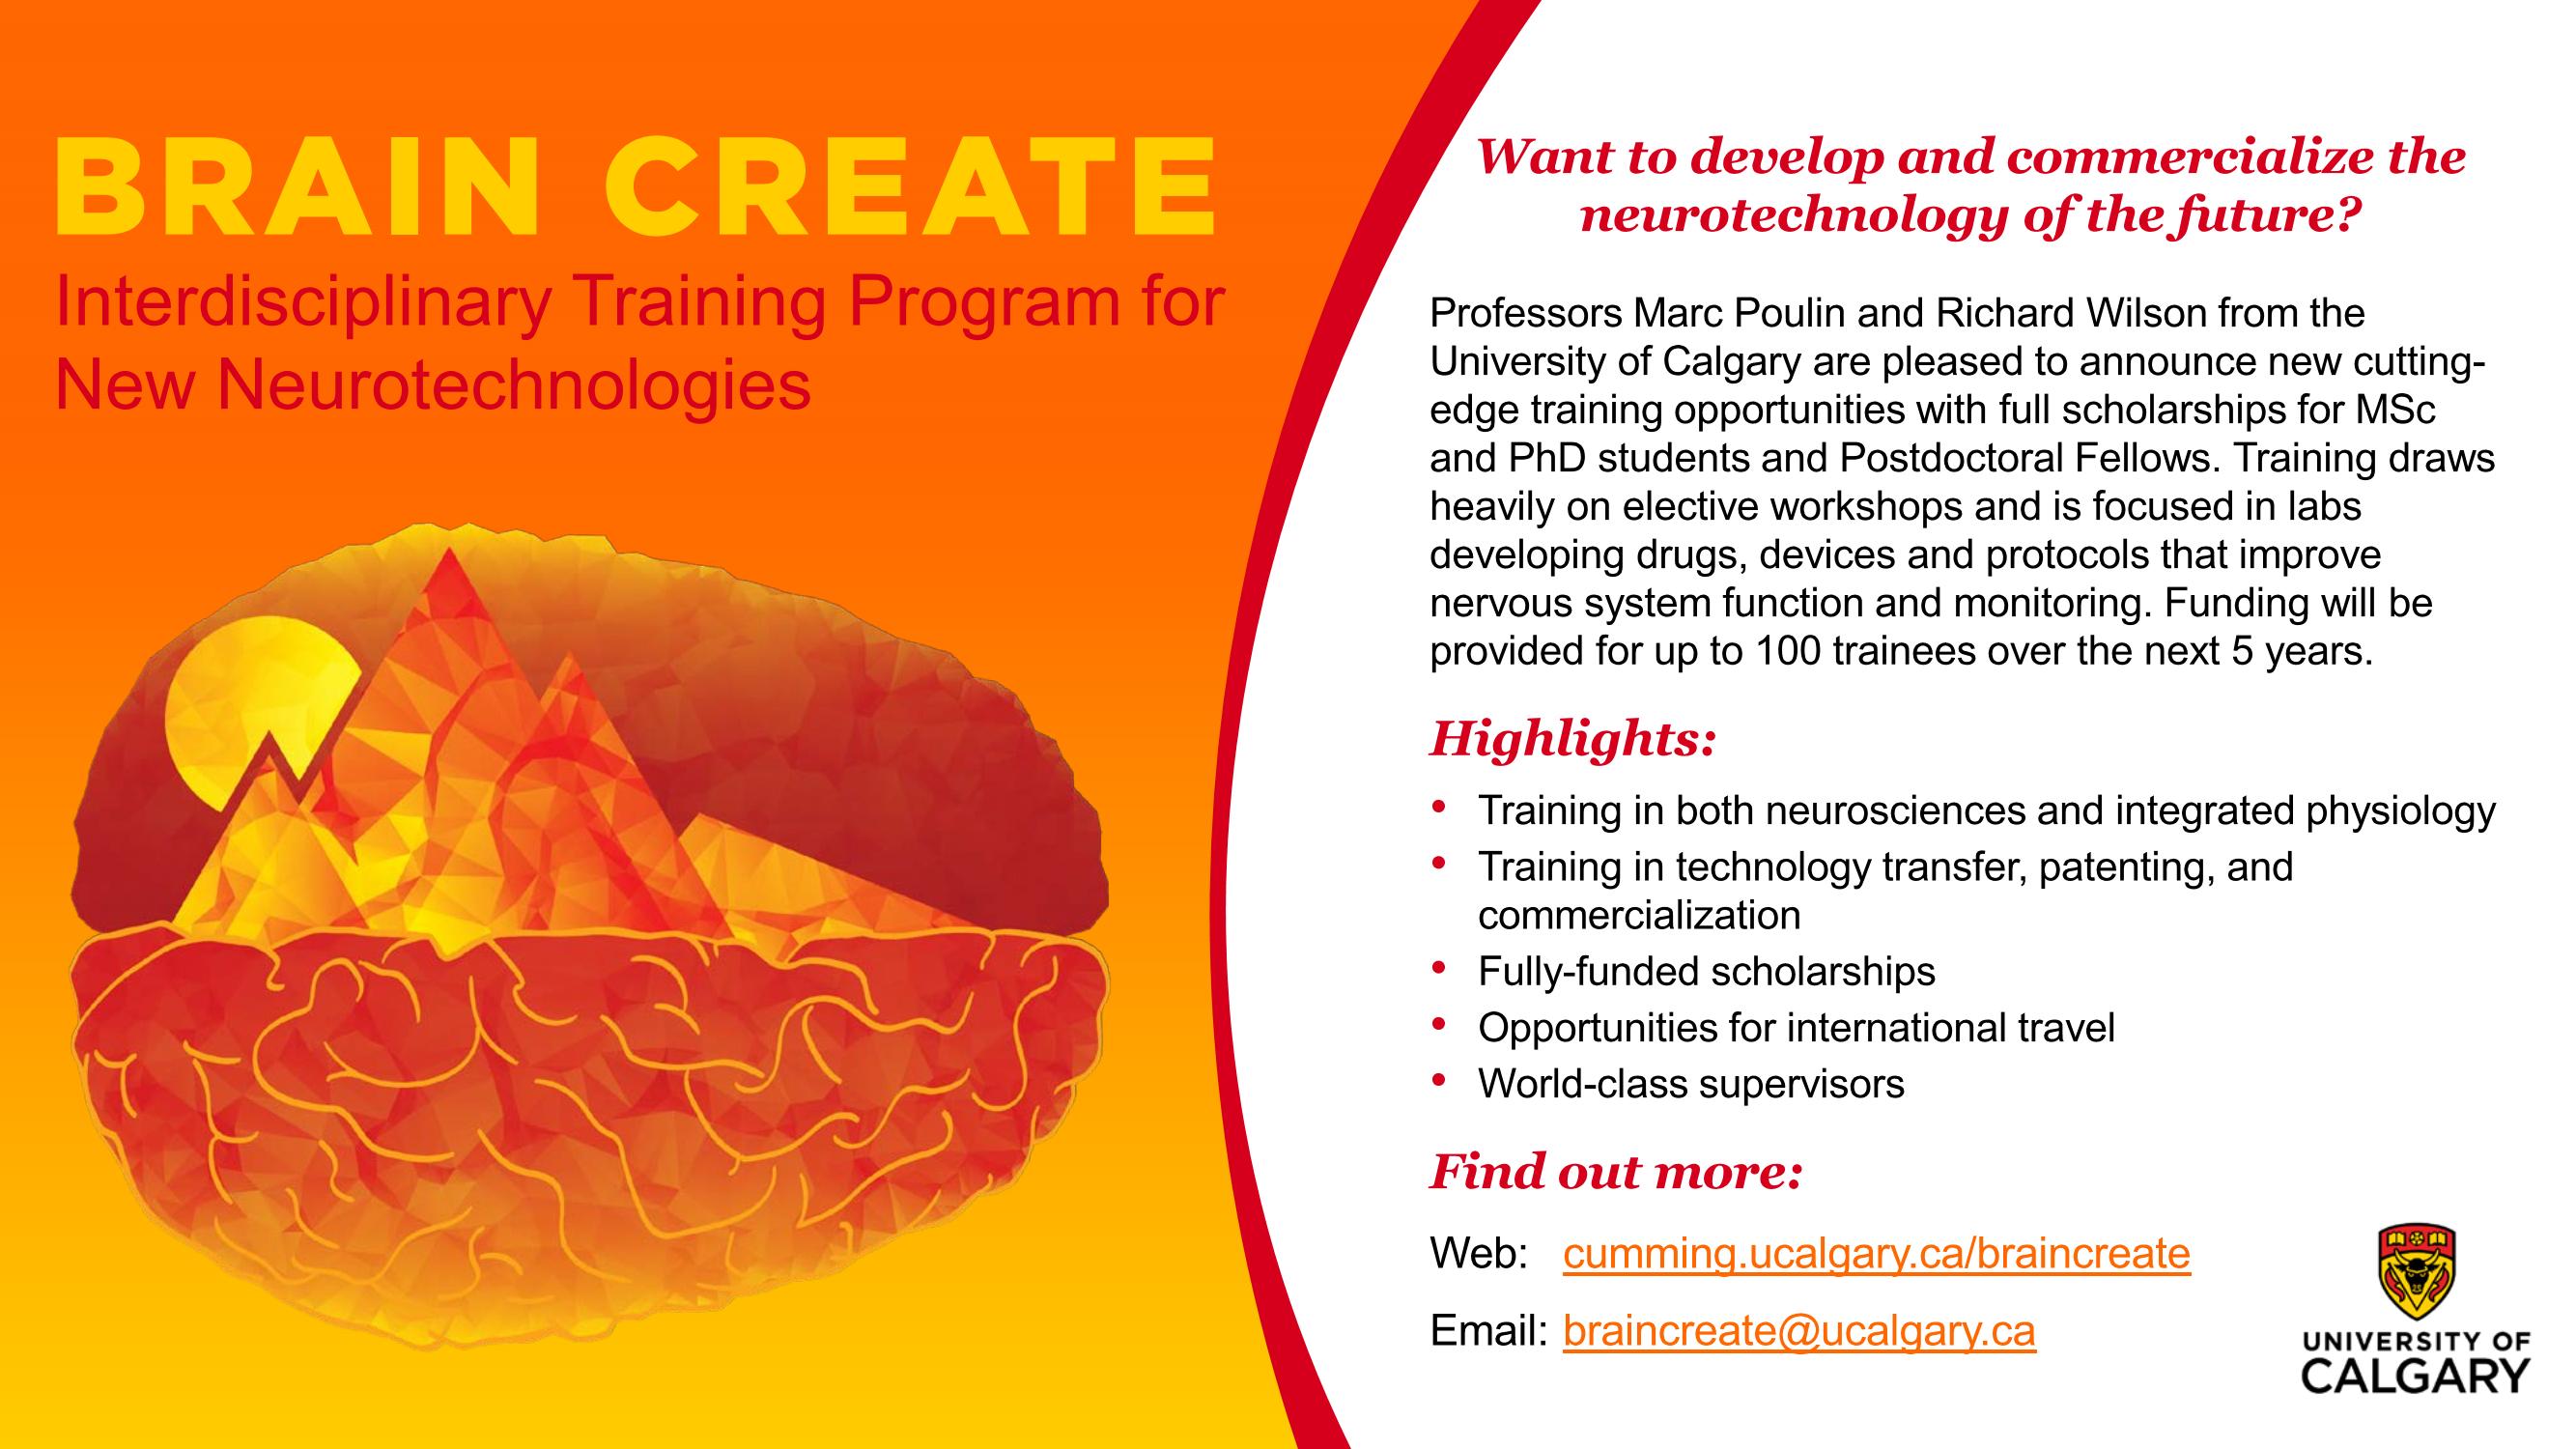 BRAIN CREATE program